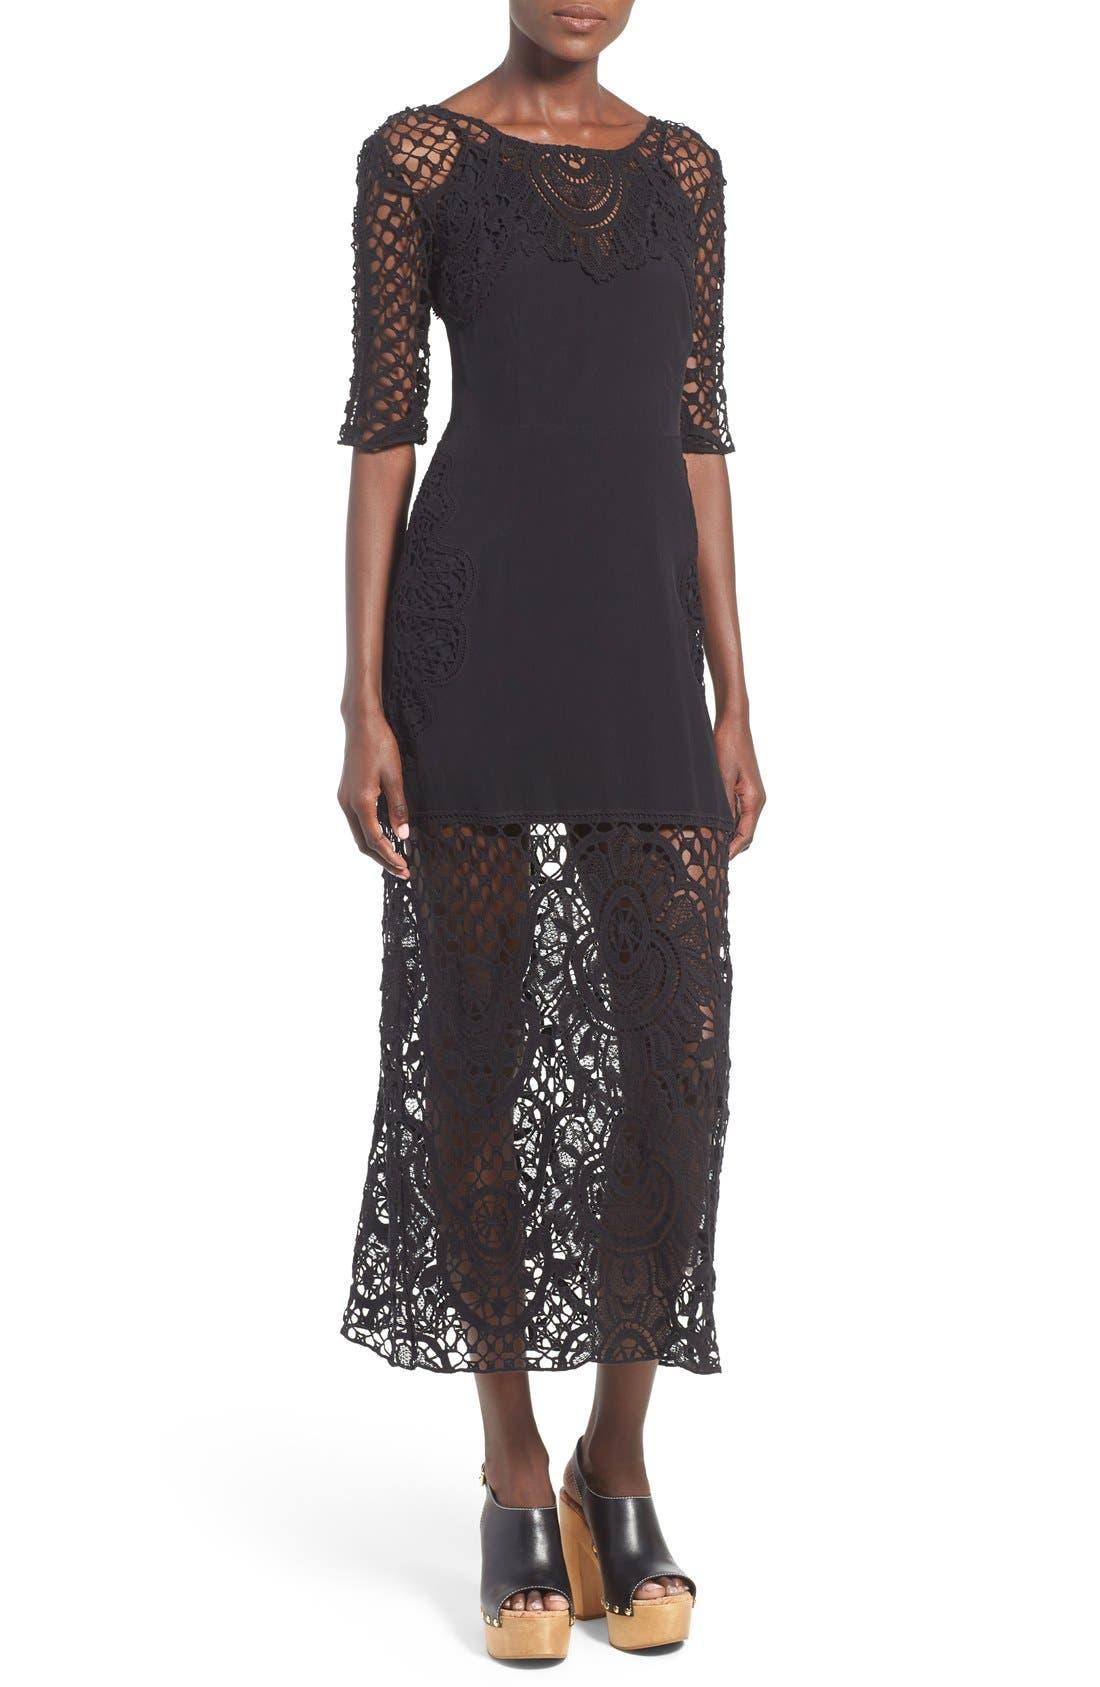 Alternate Image 1 Selected - For Love & Lemons 'Gracey' Illusion Lace Midi Dress